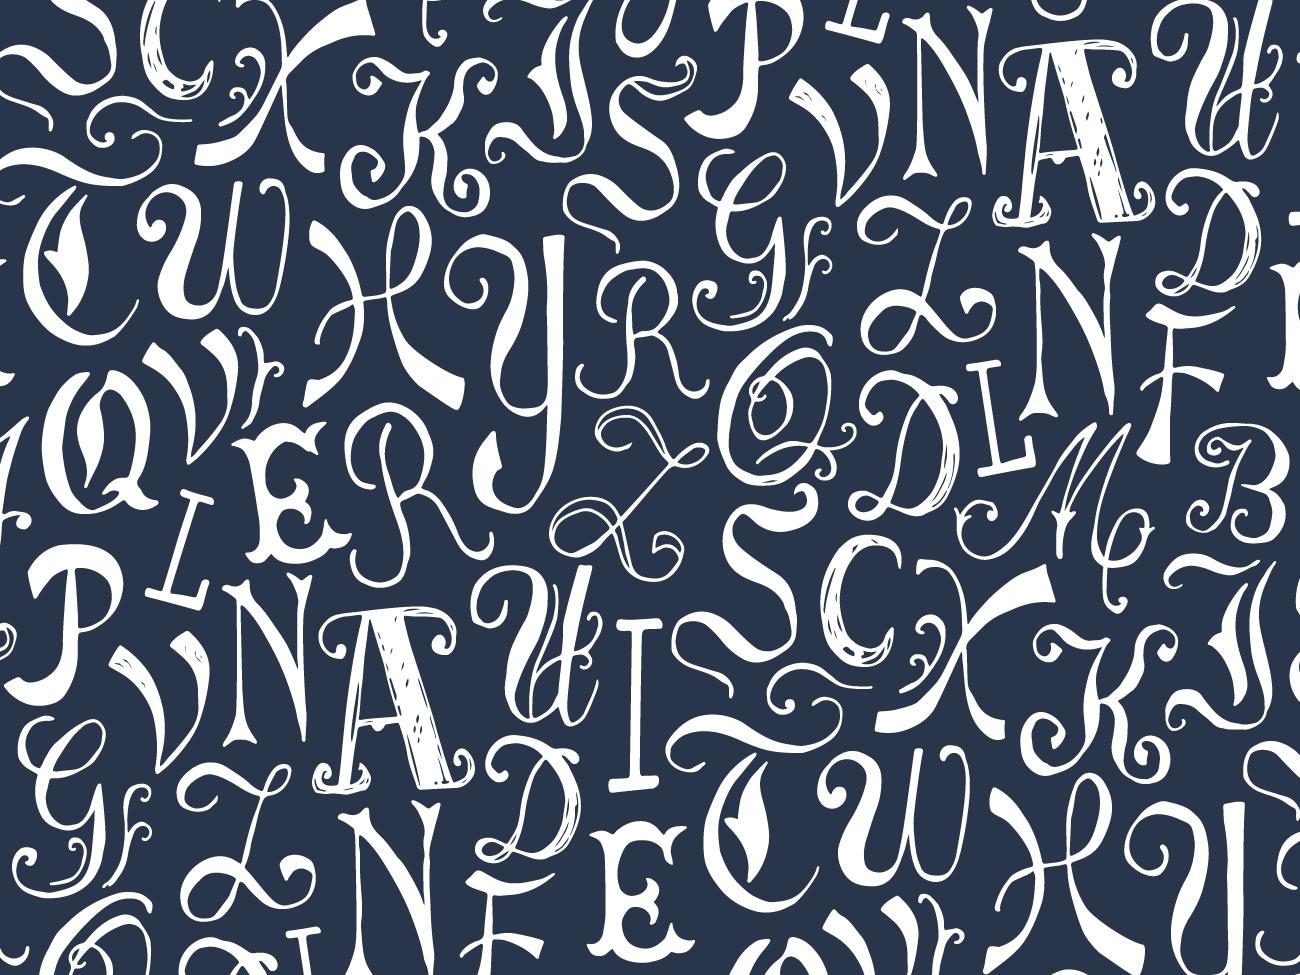 Alphabet pattern flat art calligraphy handlettering lettering art alphabets flat half drop flat design illustration vectorart repeat pattern letters pattern design pattern typography alphabet lettering vector digital art